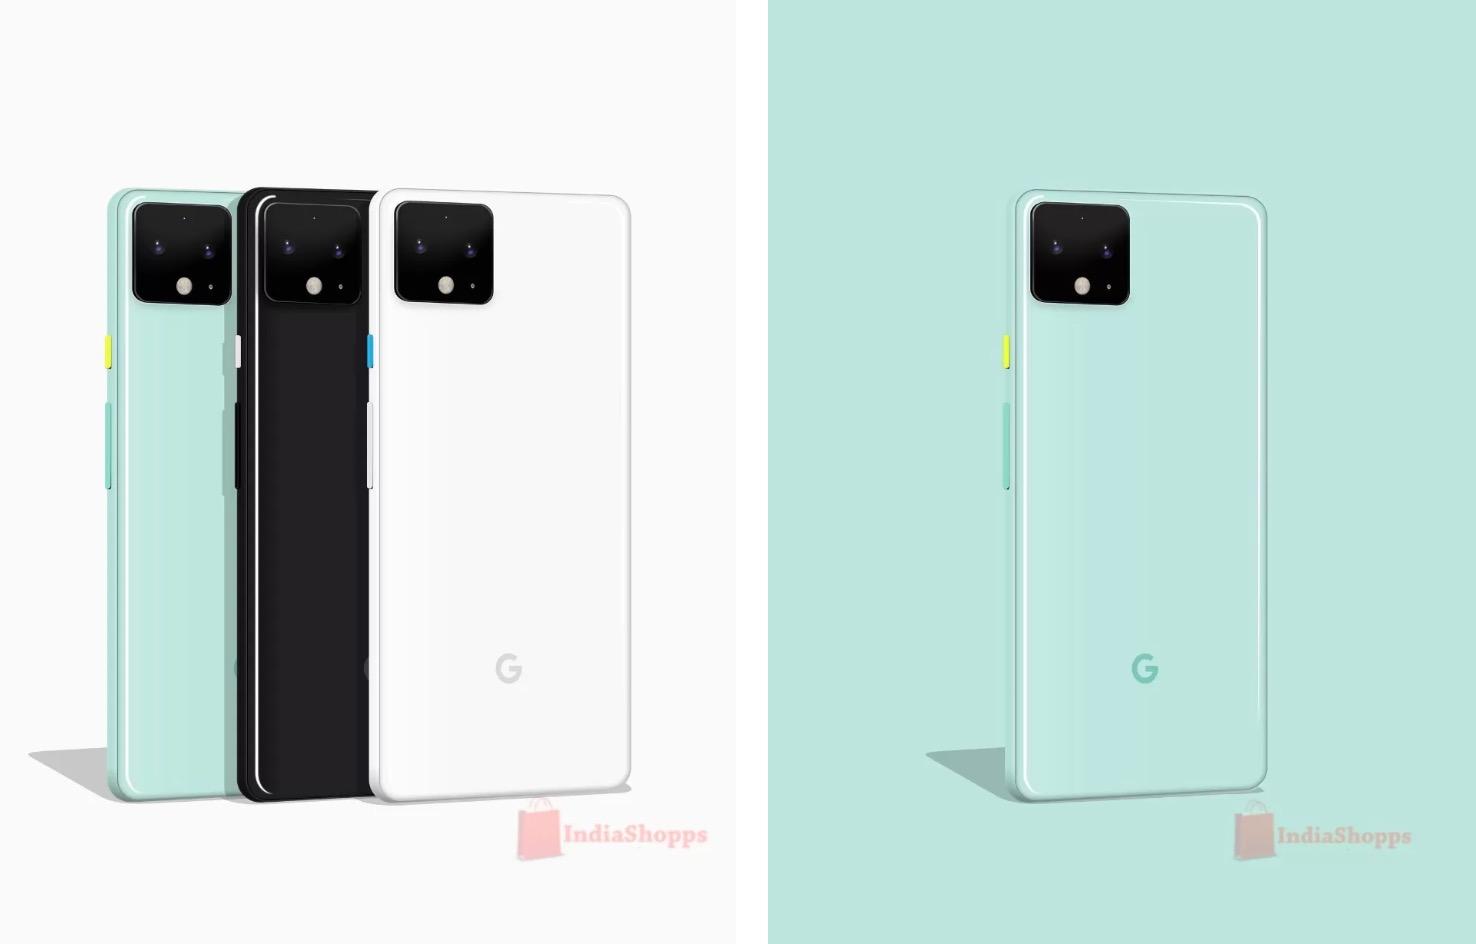 Google conferma alcune gesture del nuovo Pixel 4